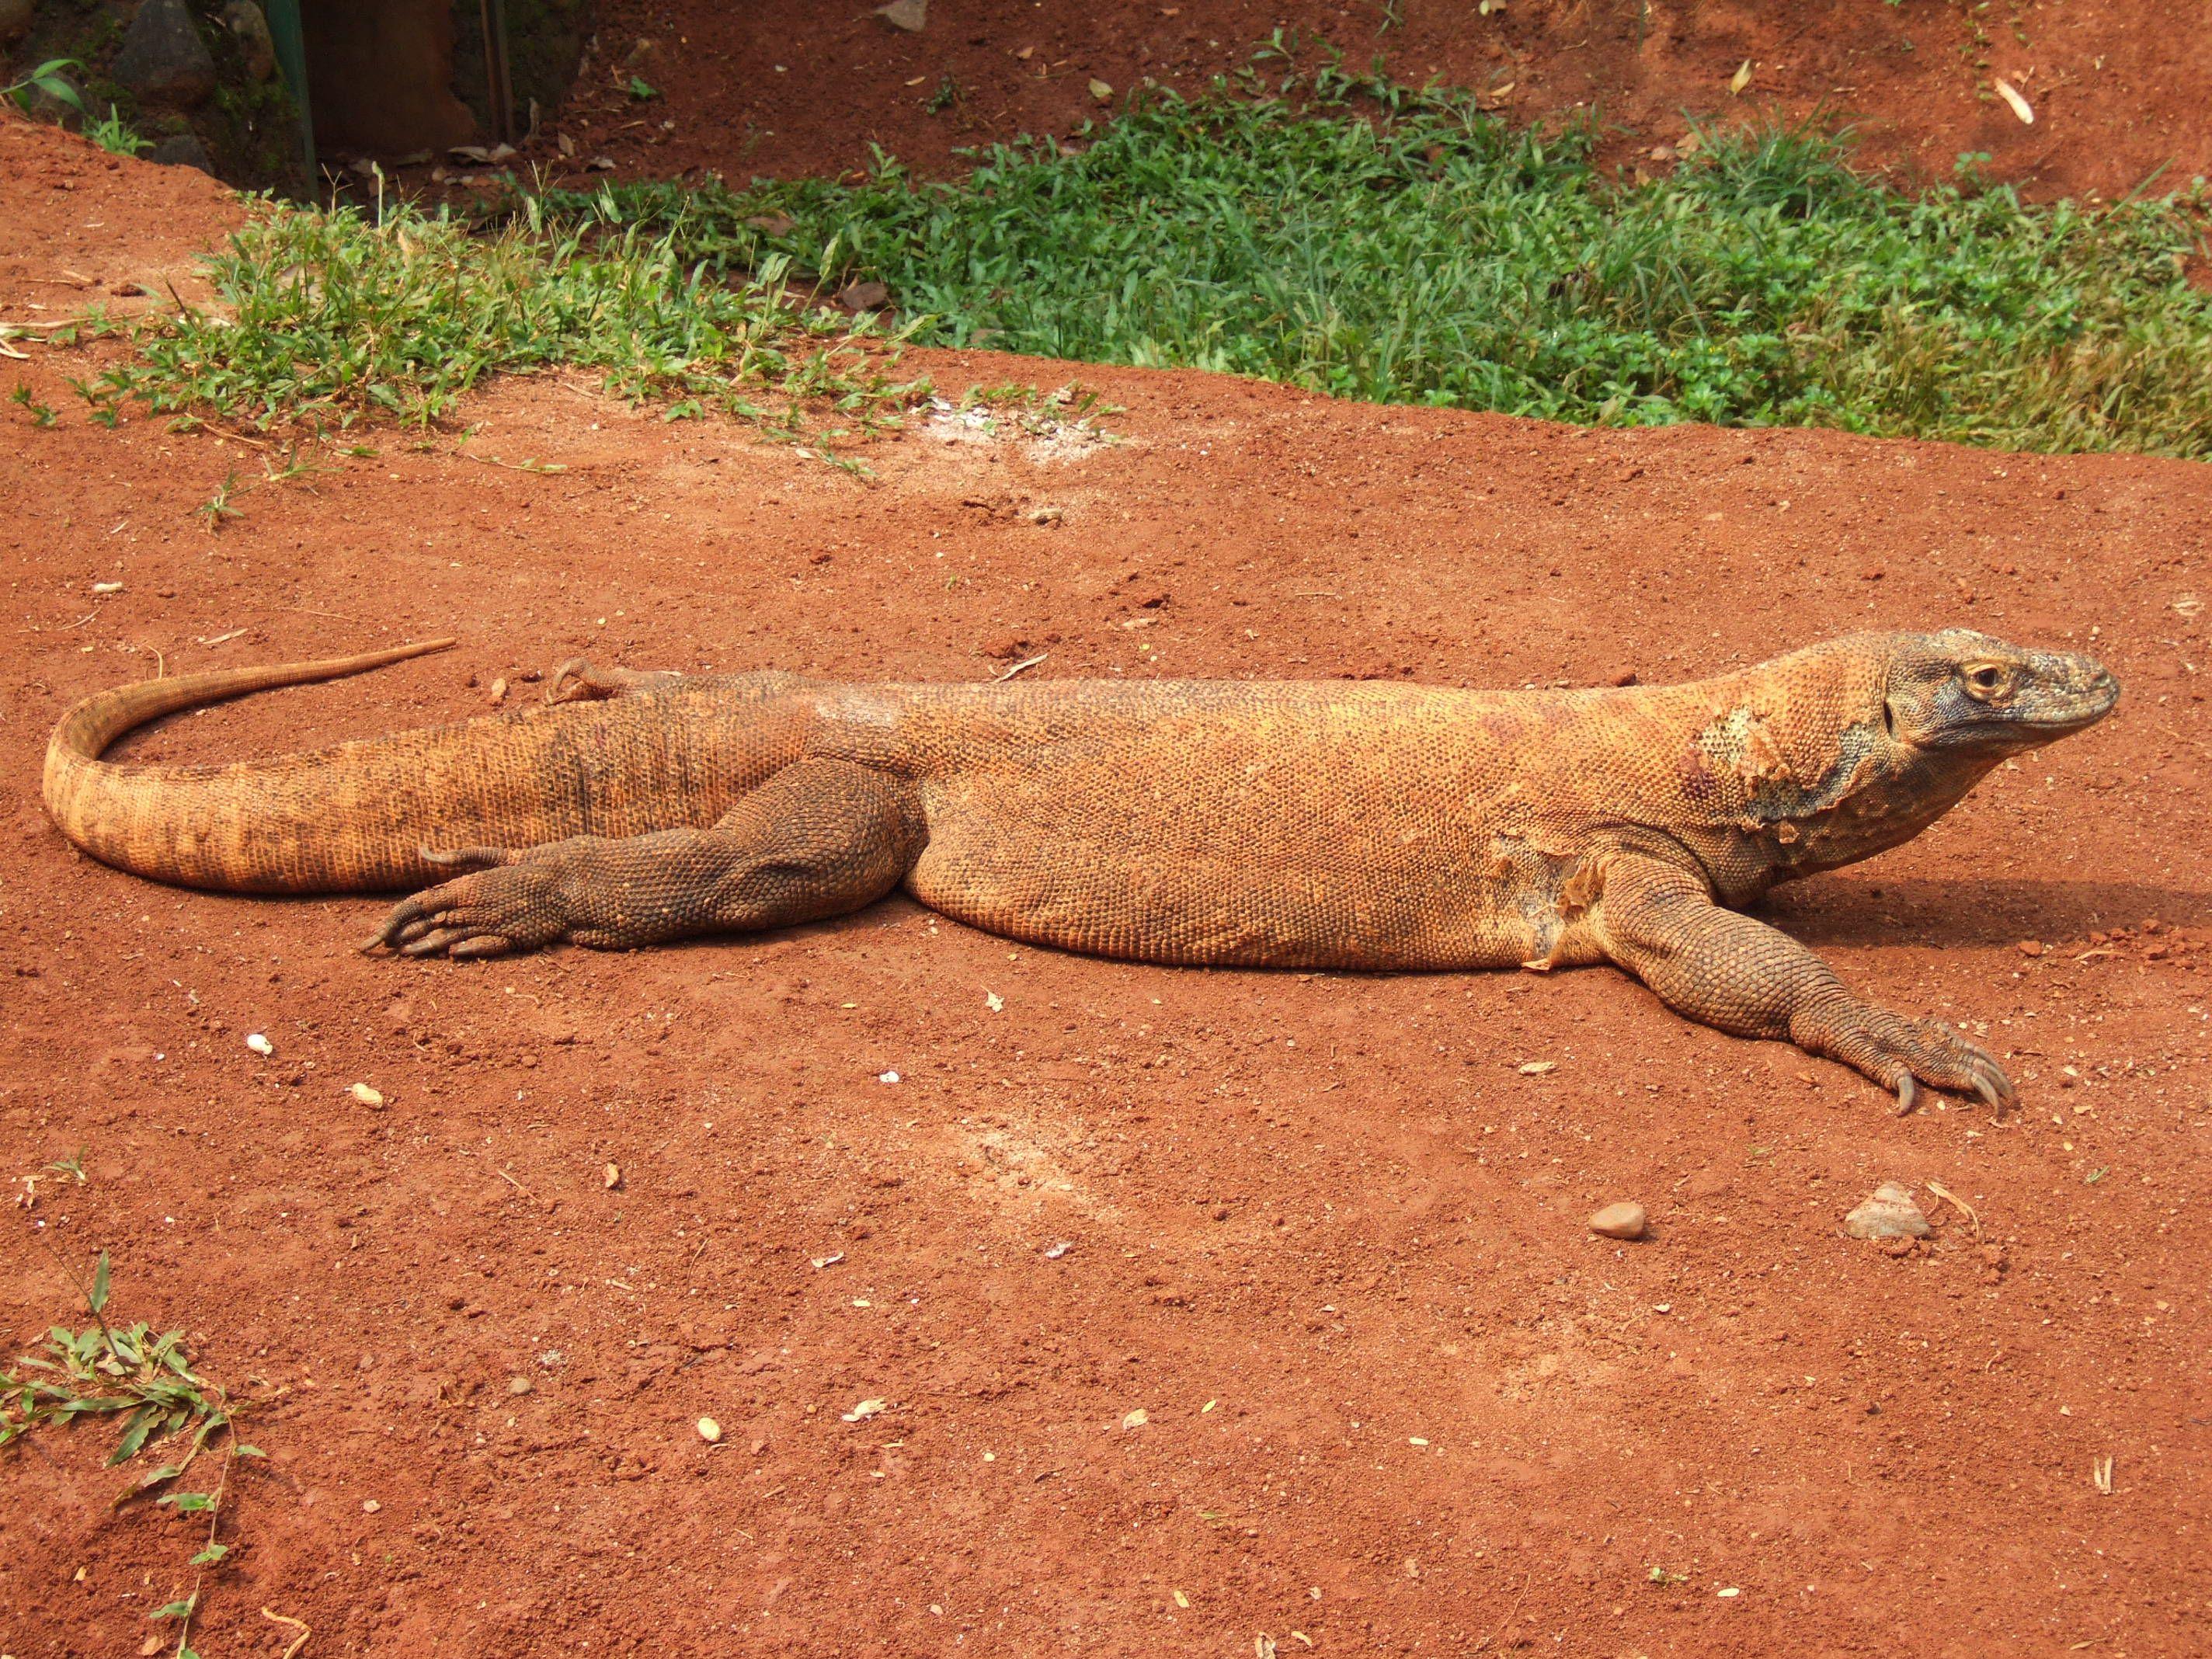 Komodo dragon crawling in the sand.